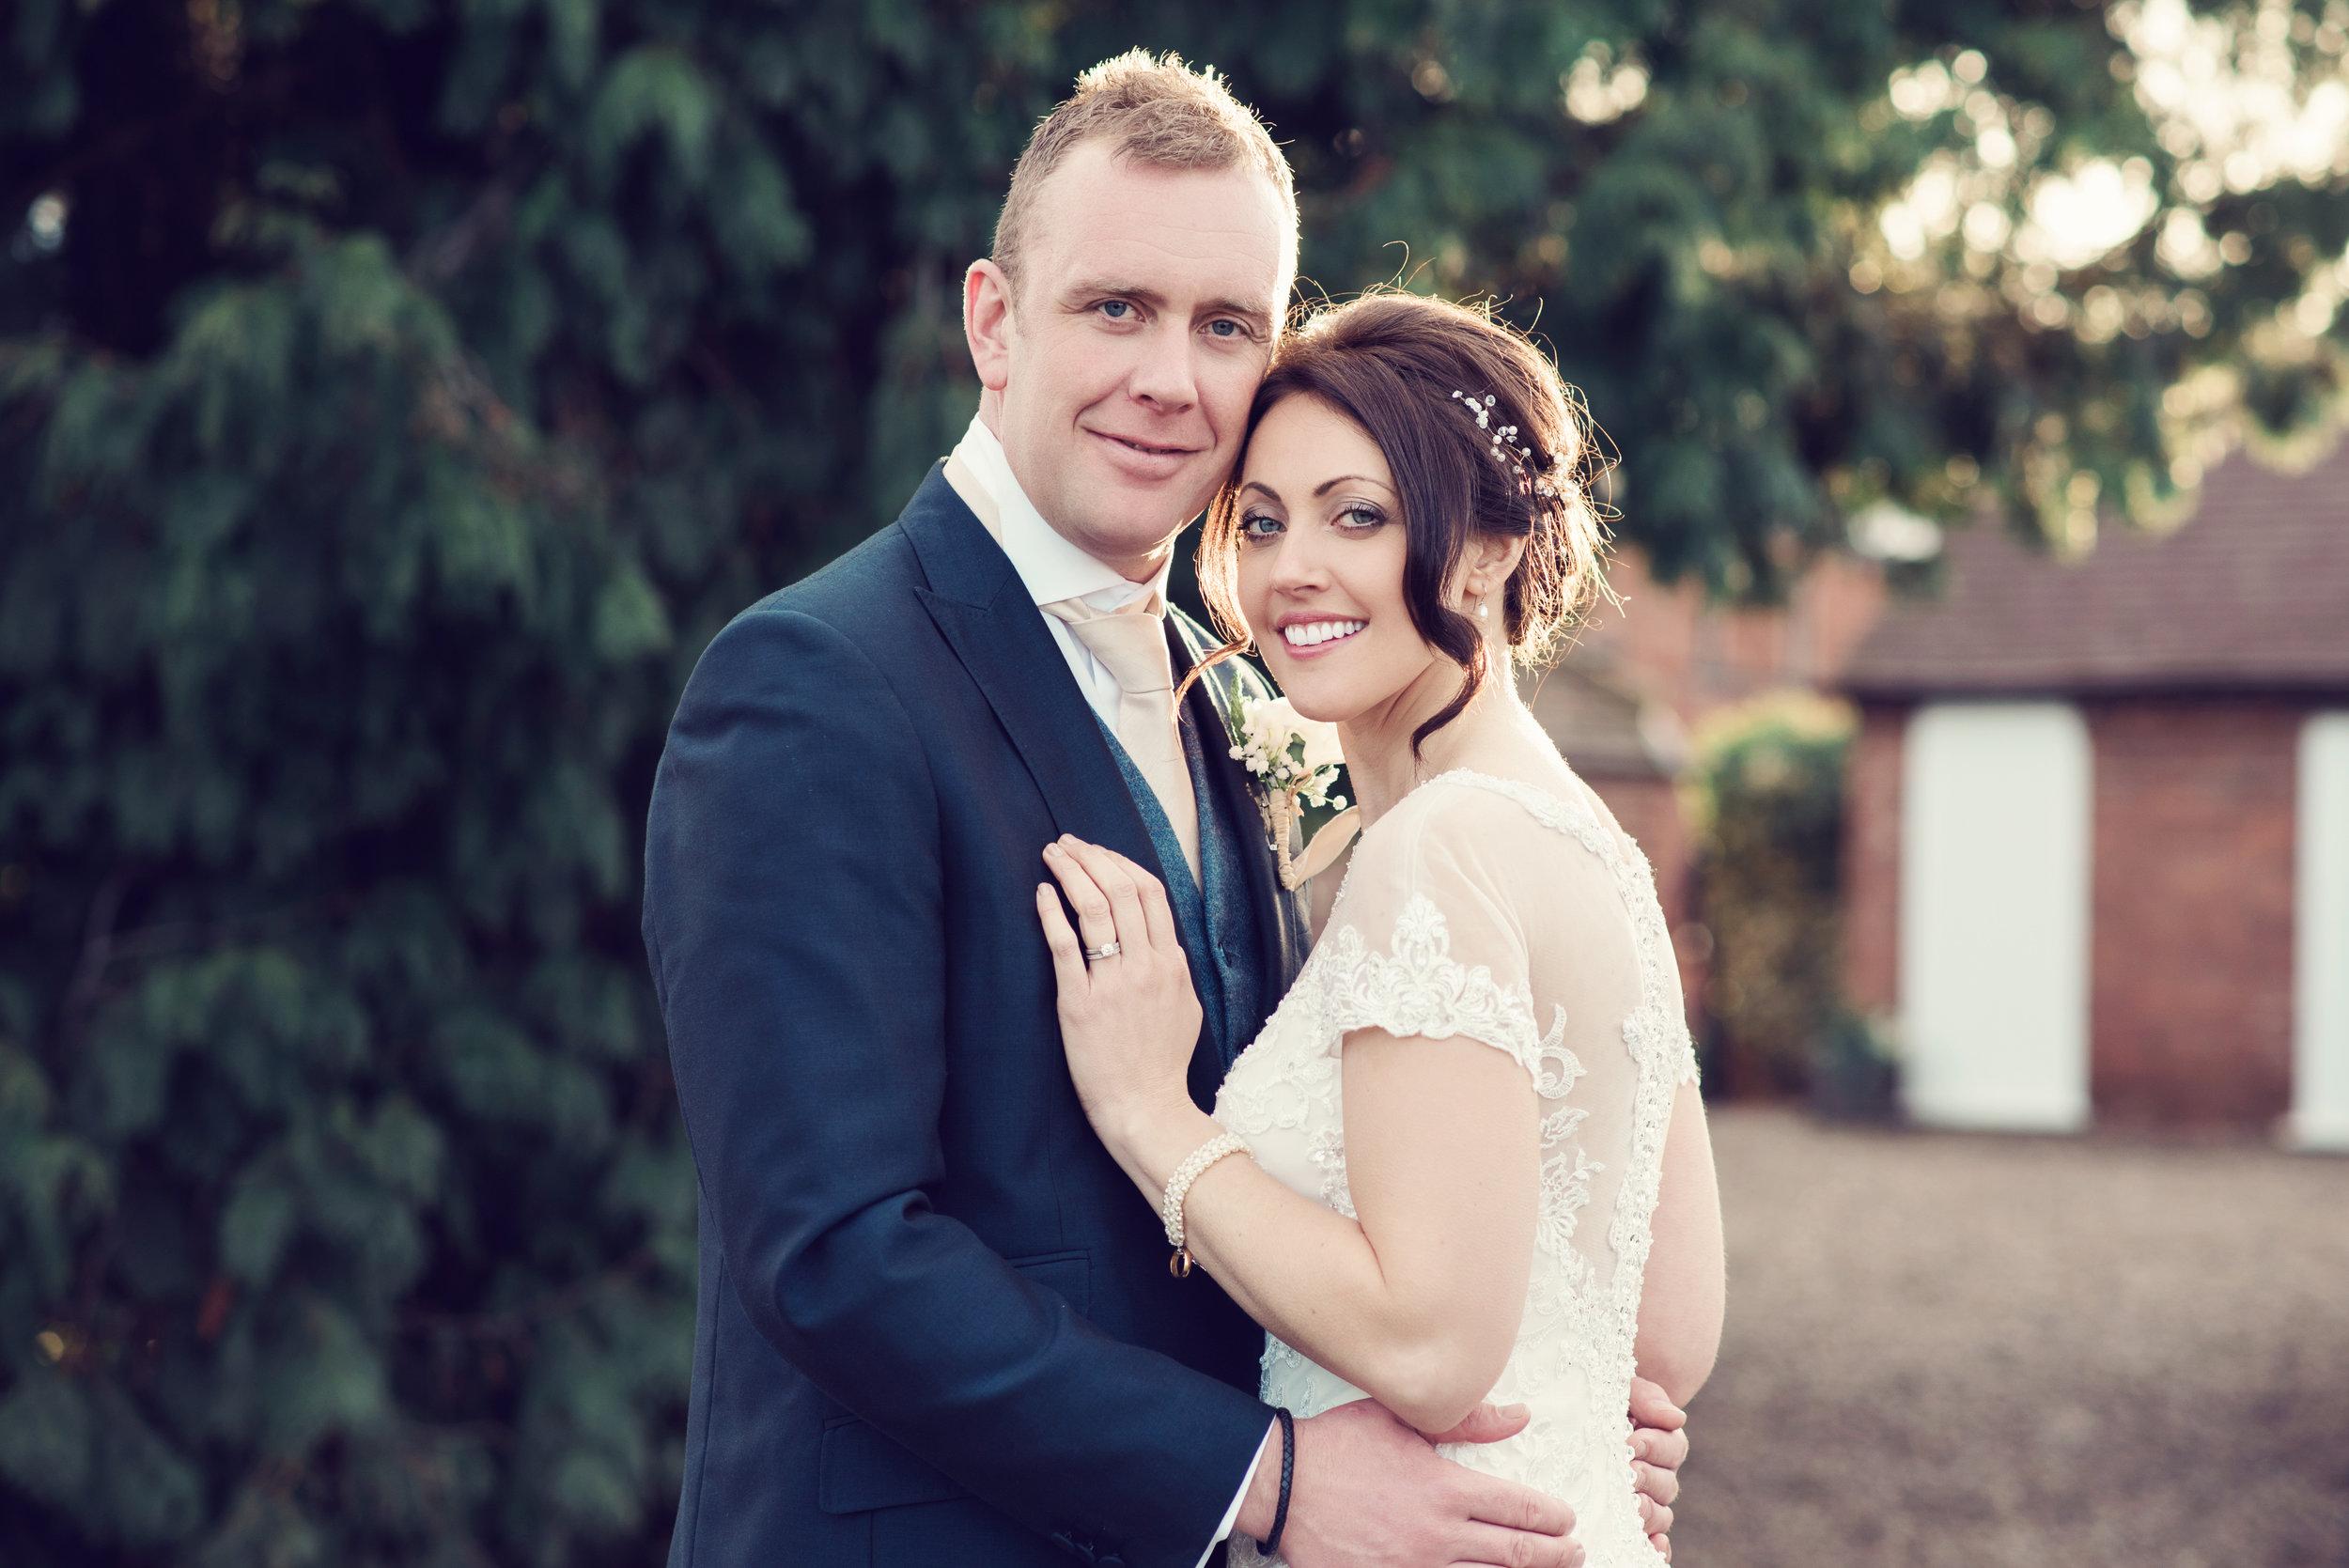 jessica-raphael-photography-curradine-barns-weddings